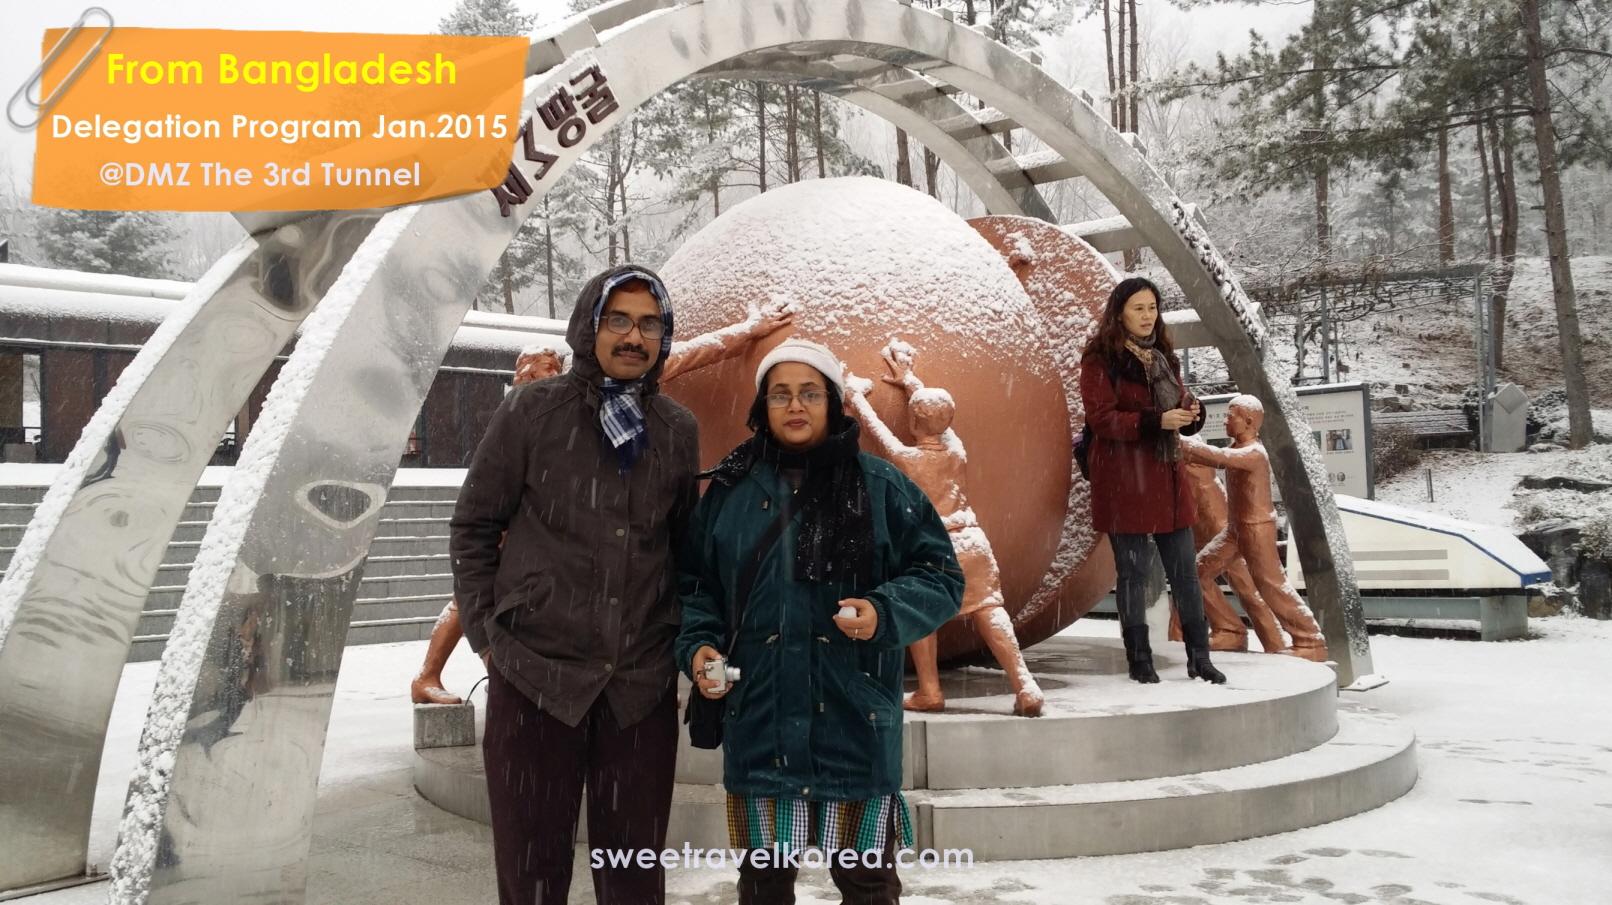 Bangladesh-DMZ.jpg